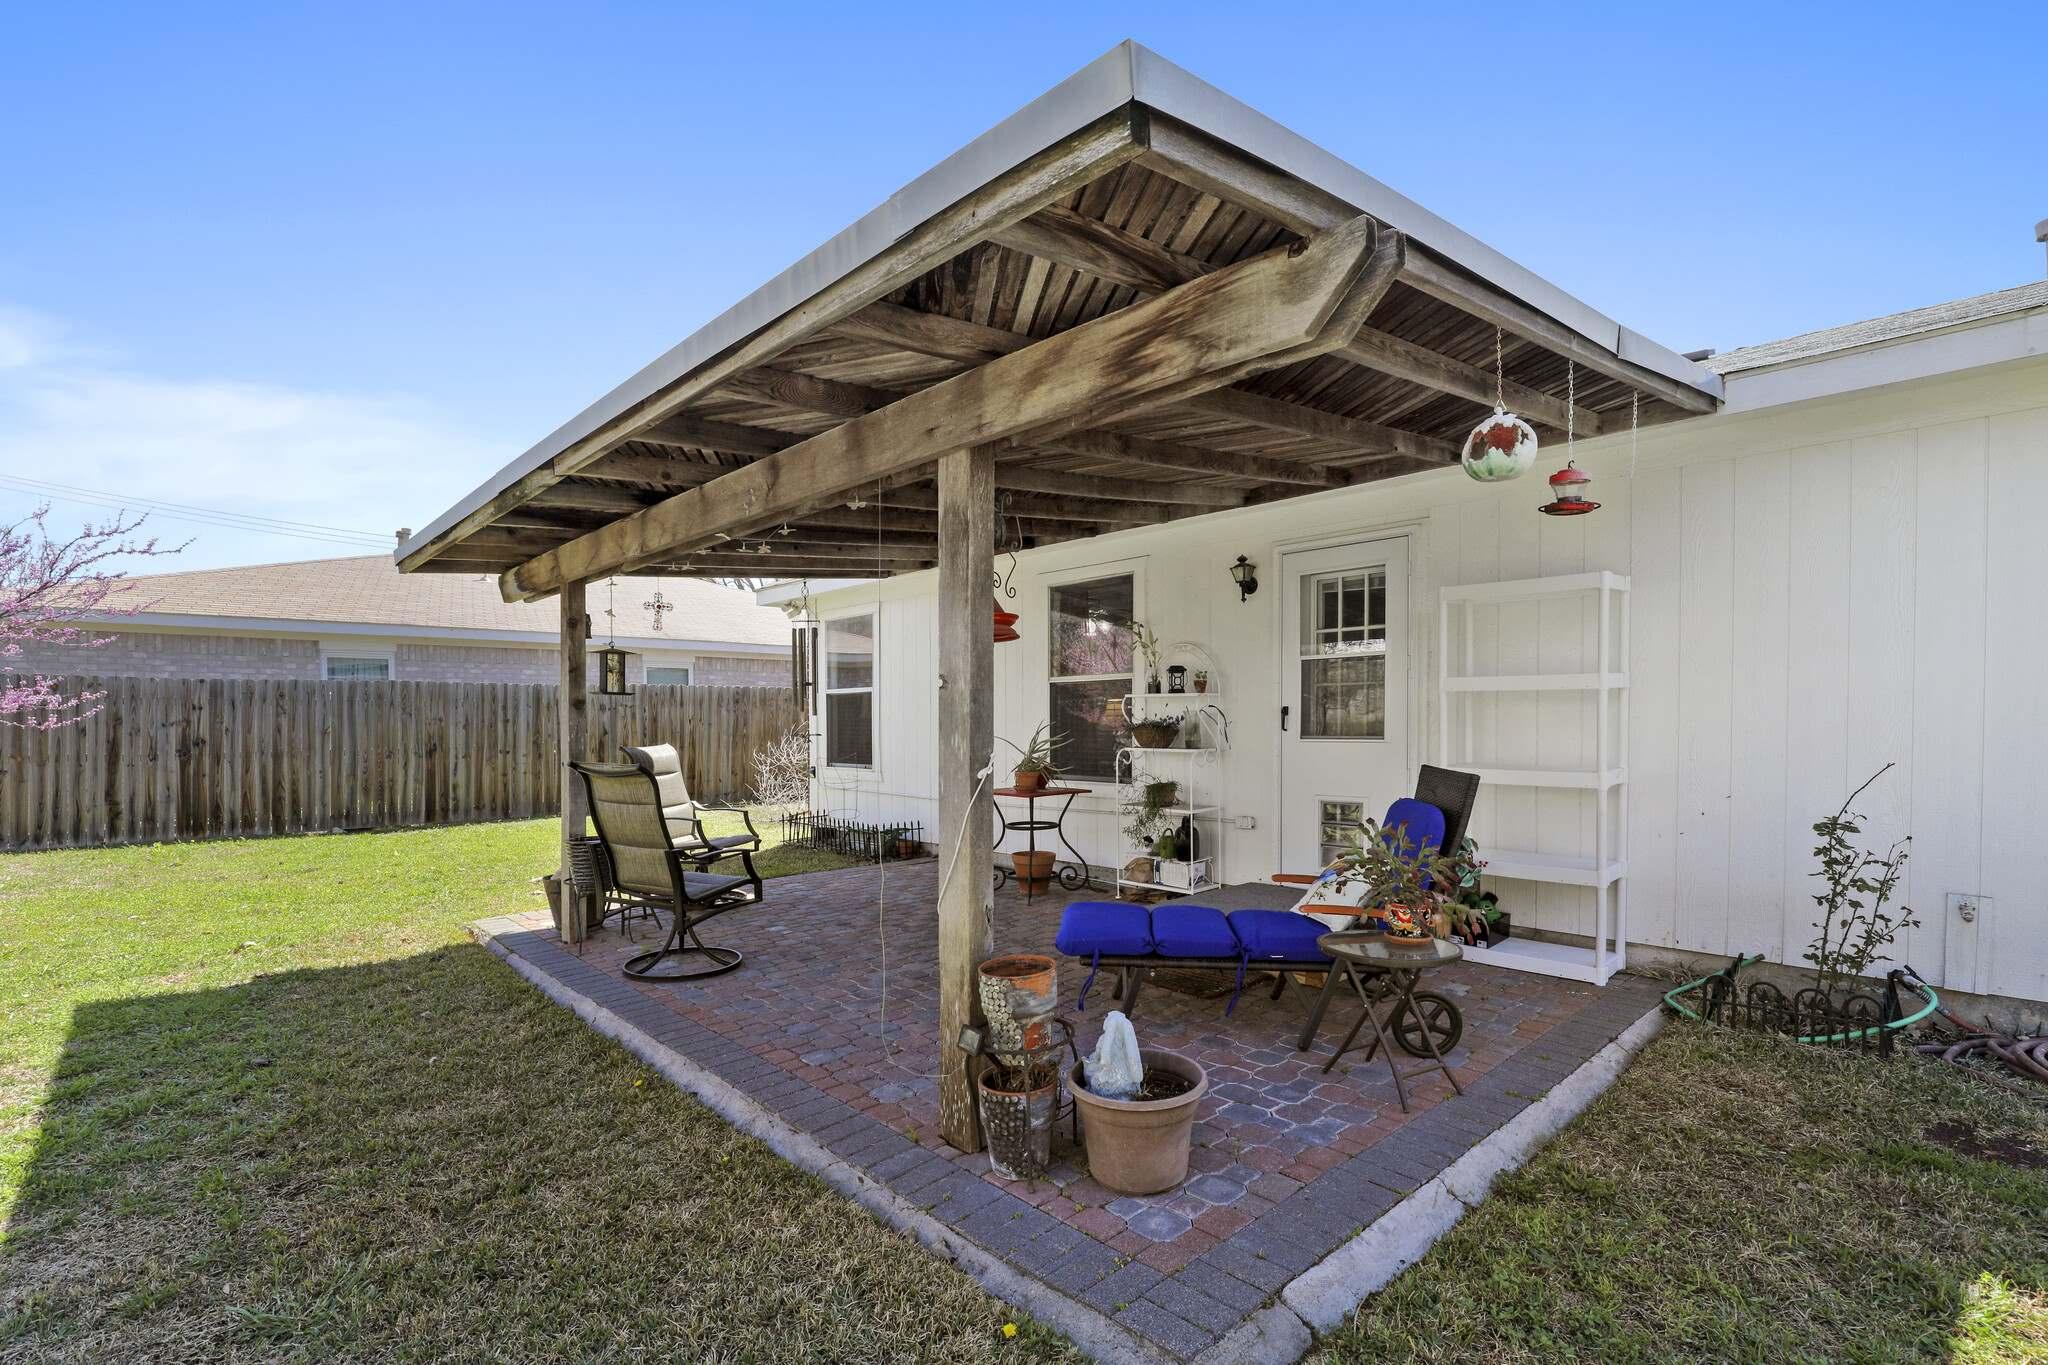 10808 Hornby St, Ft Worth, TX 76108